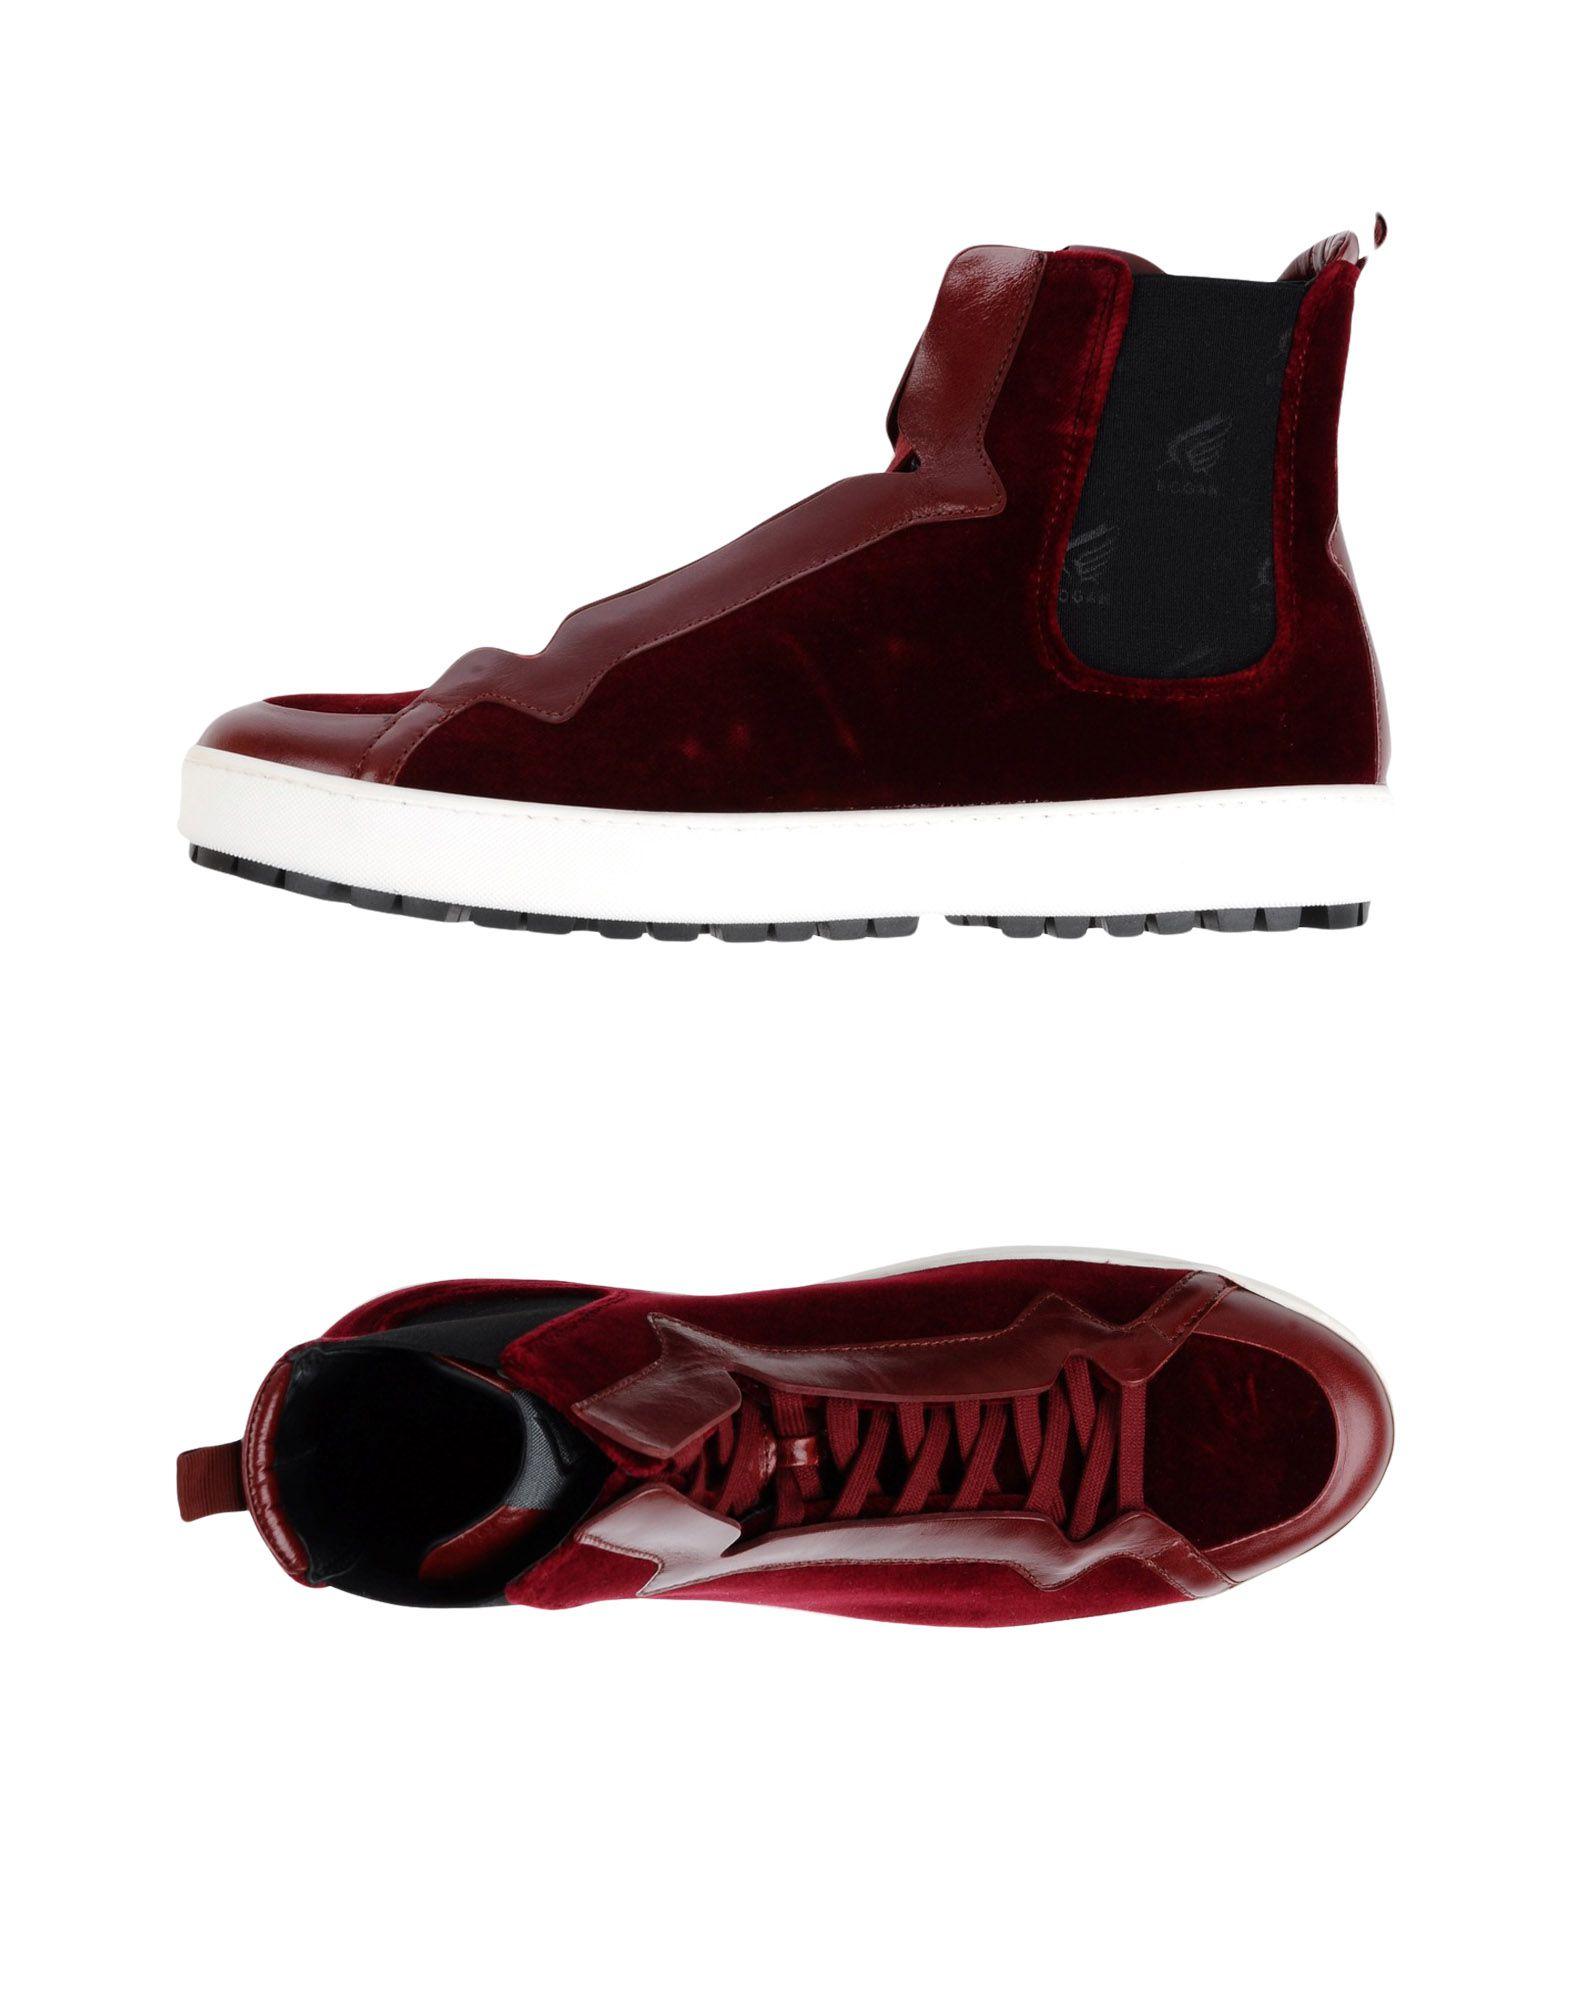 Moda Sneakers Hogan Uomo - 11299924GR